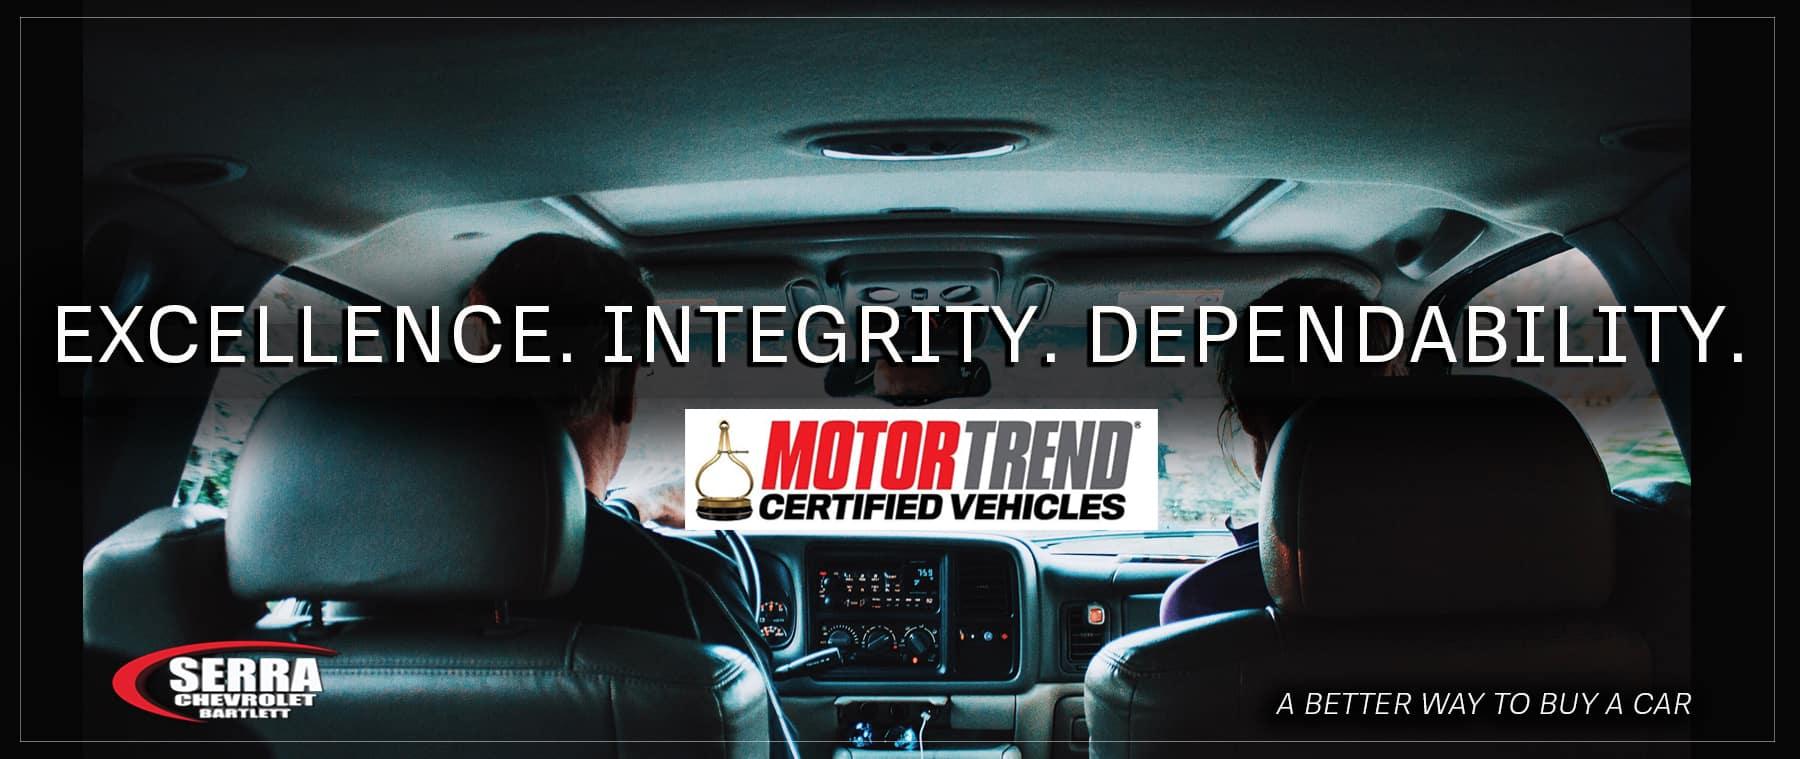 Motortrend Certified Vehicles at Serra Chevrolet Bartlett